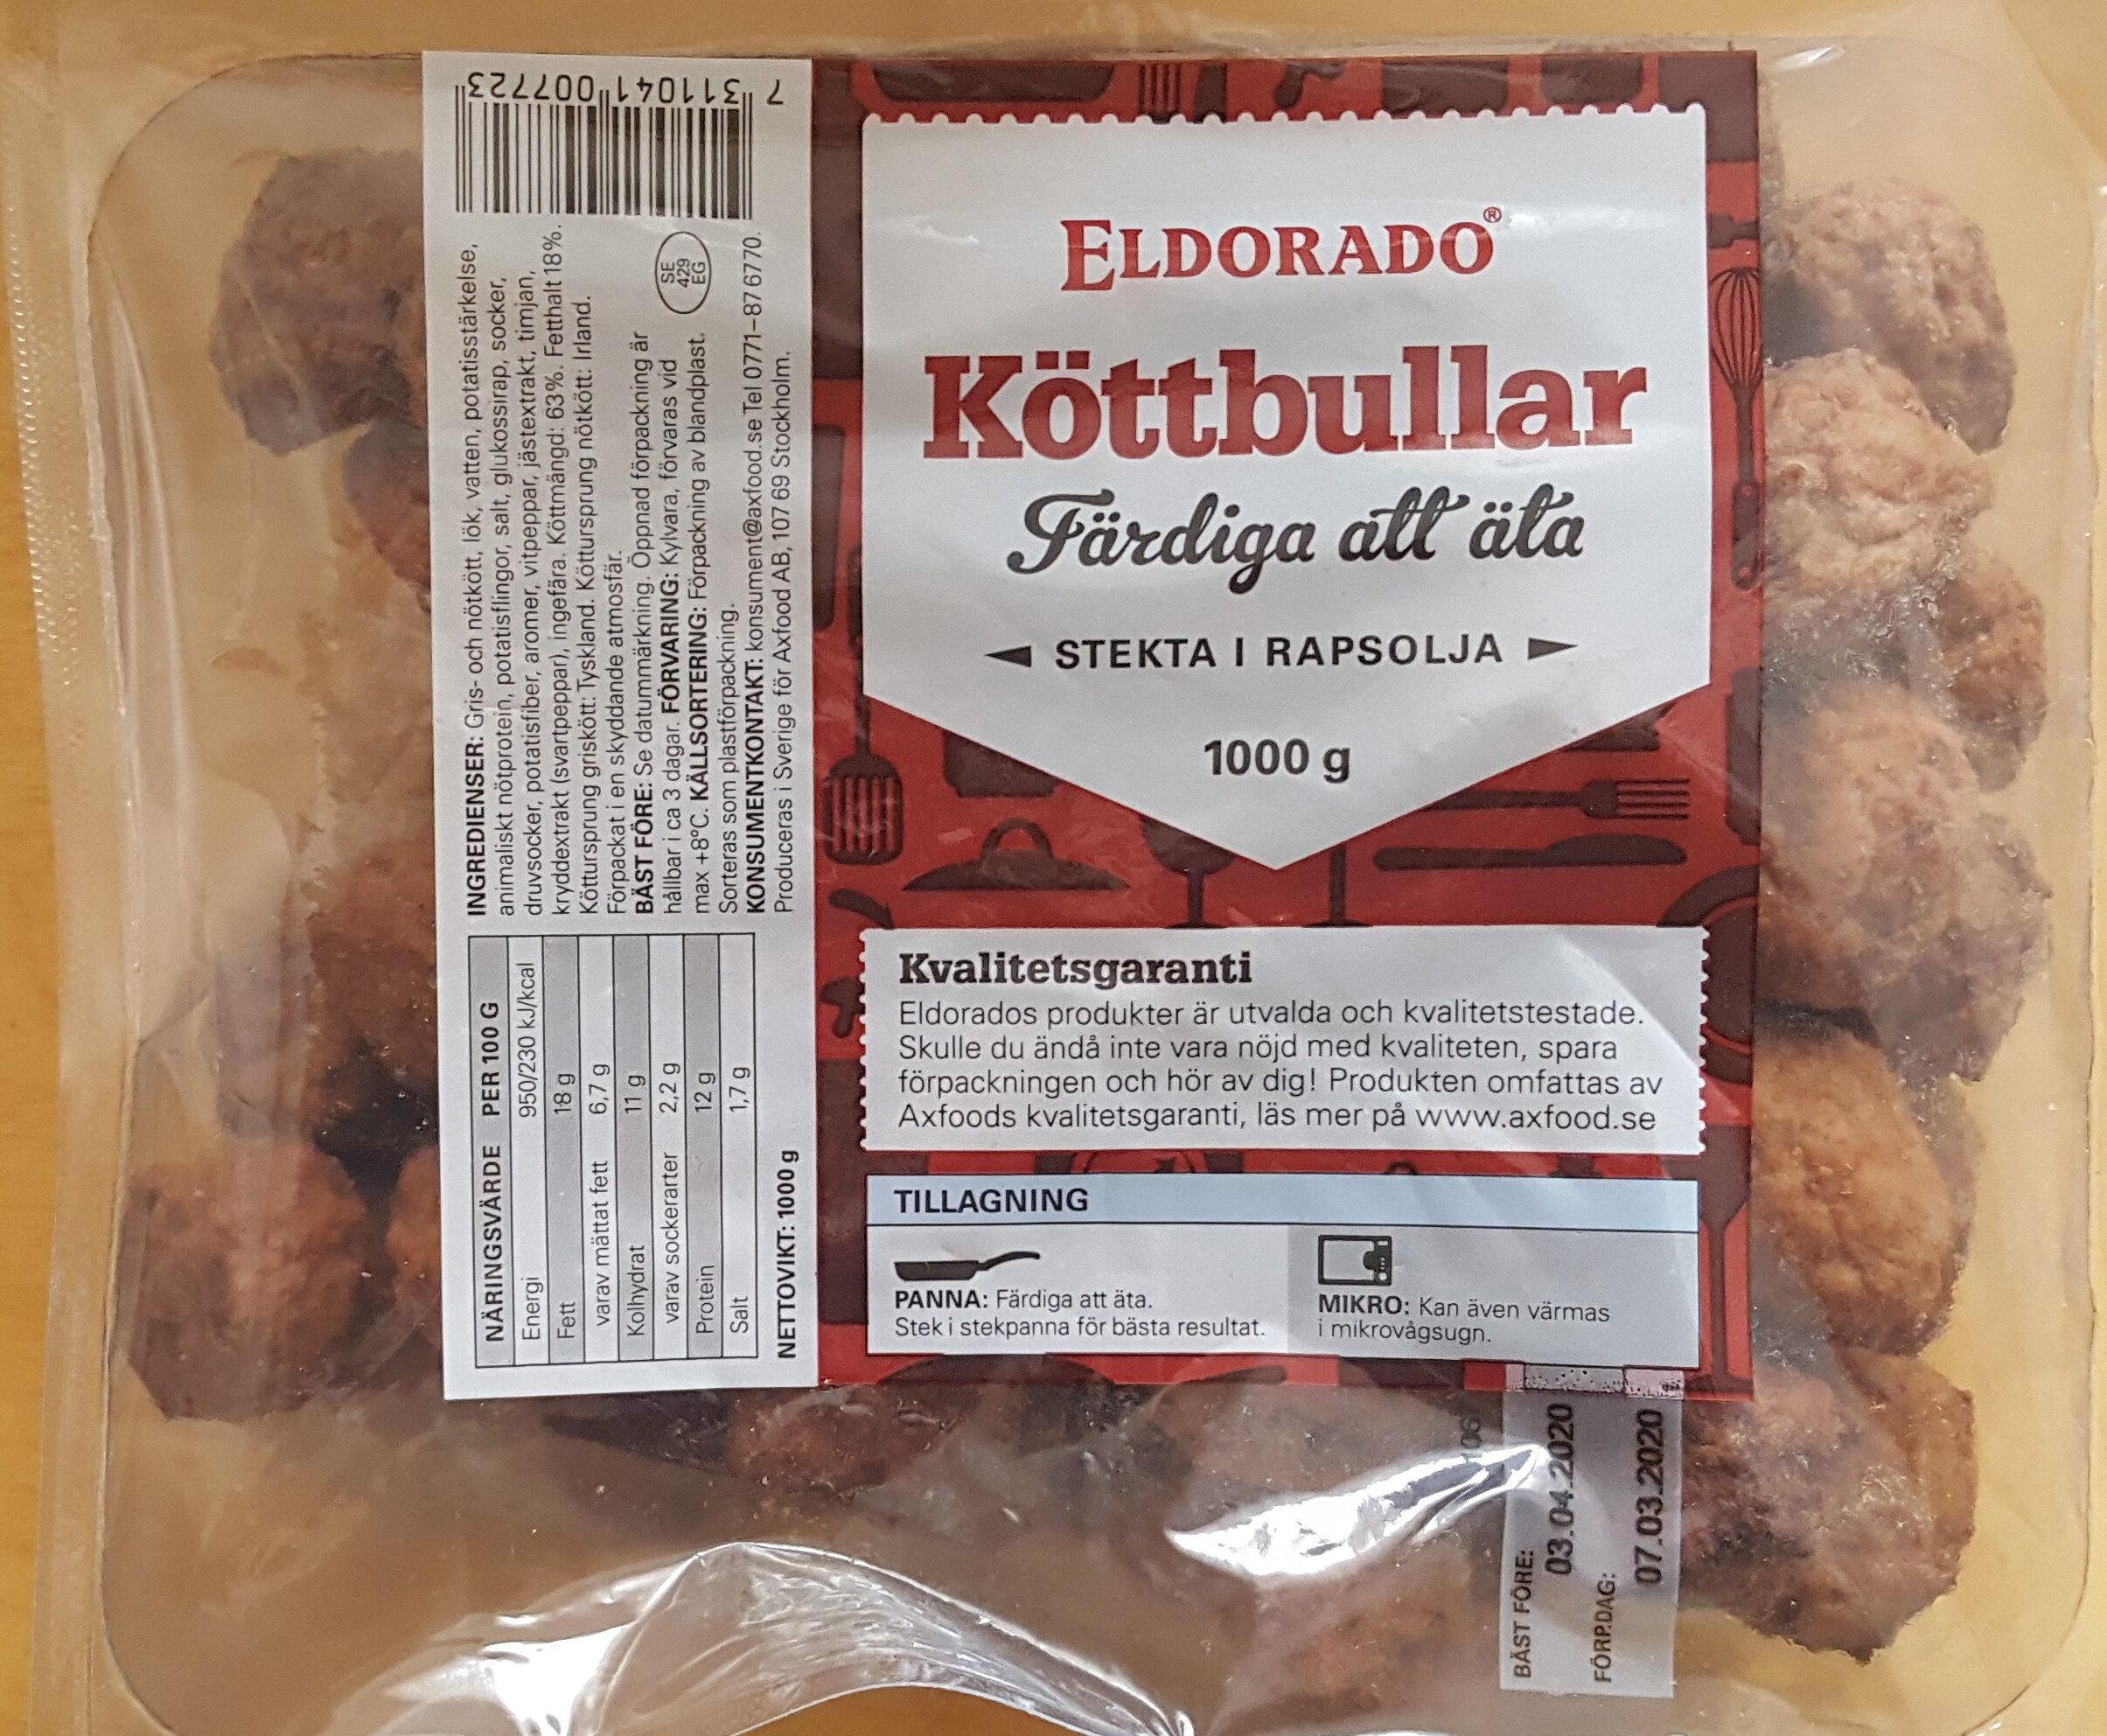 Eldorado Köttbullar - Product - sv